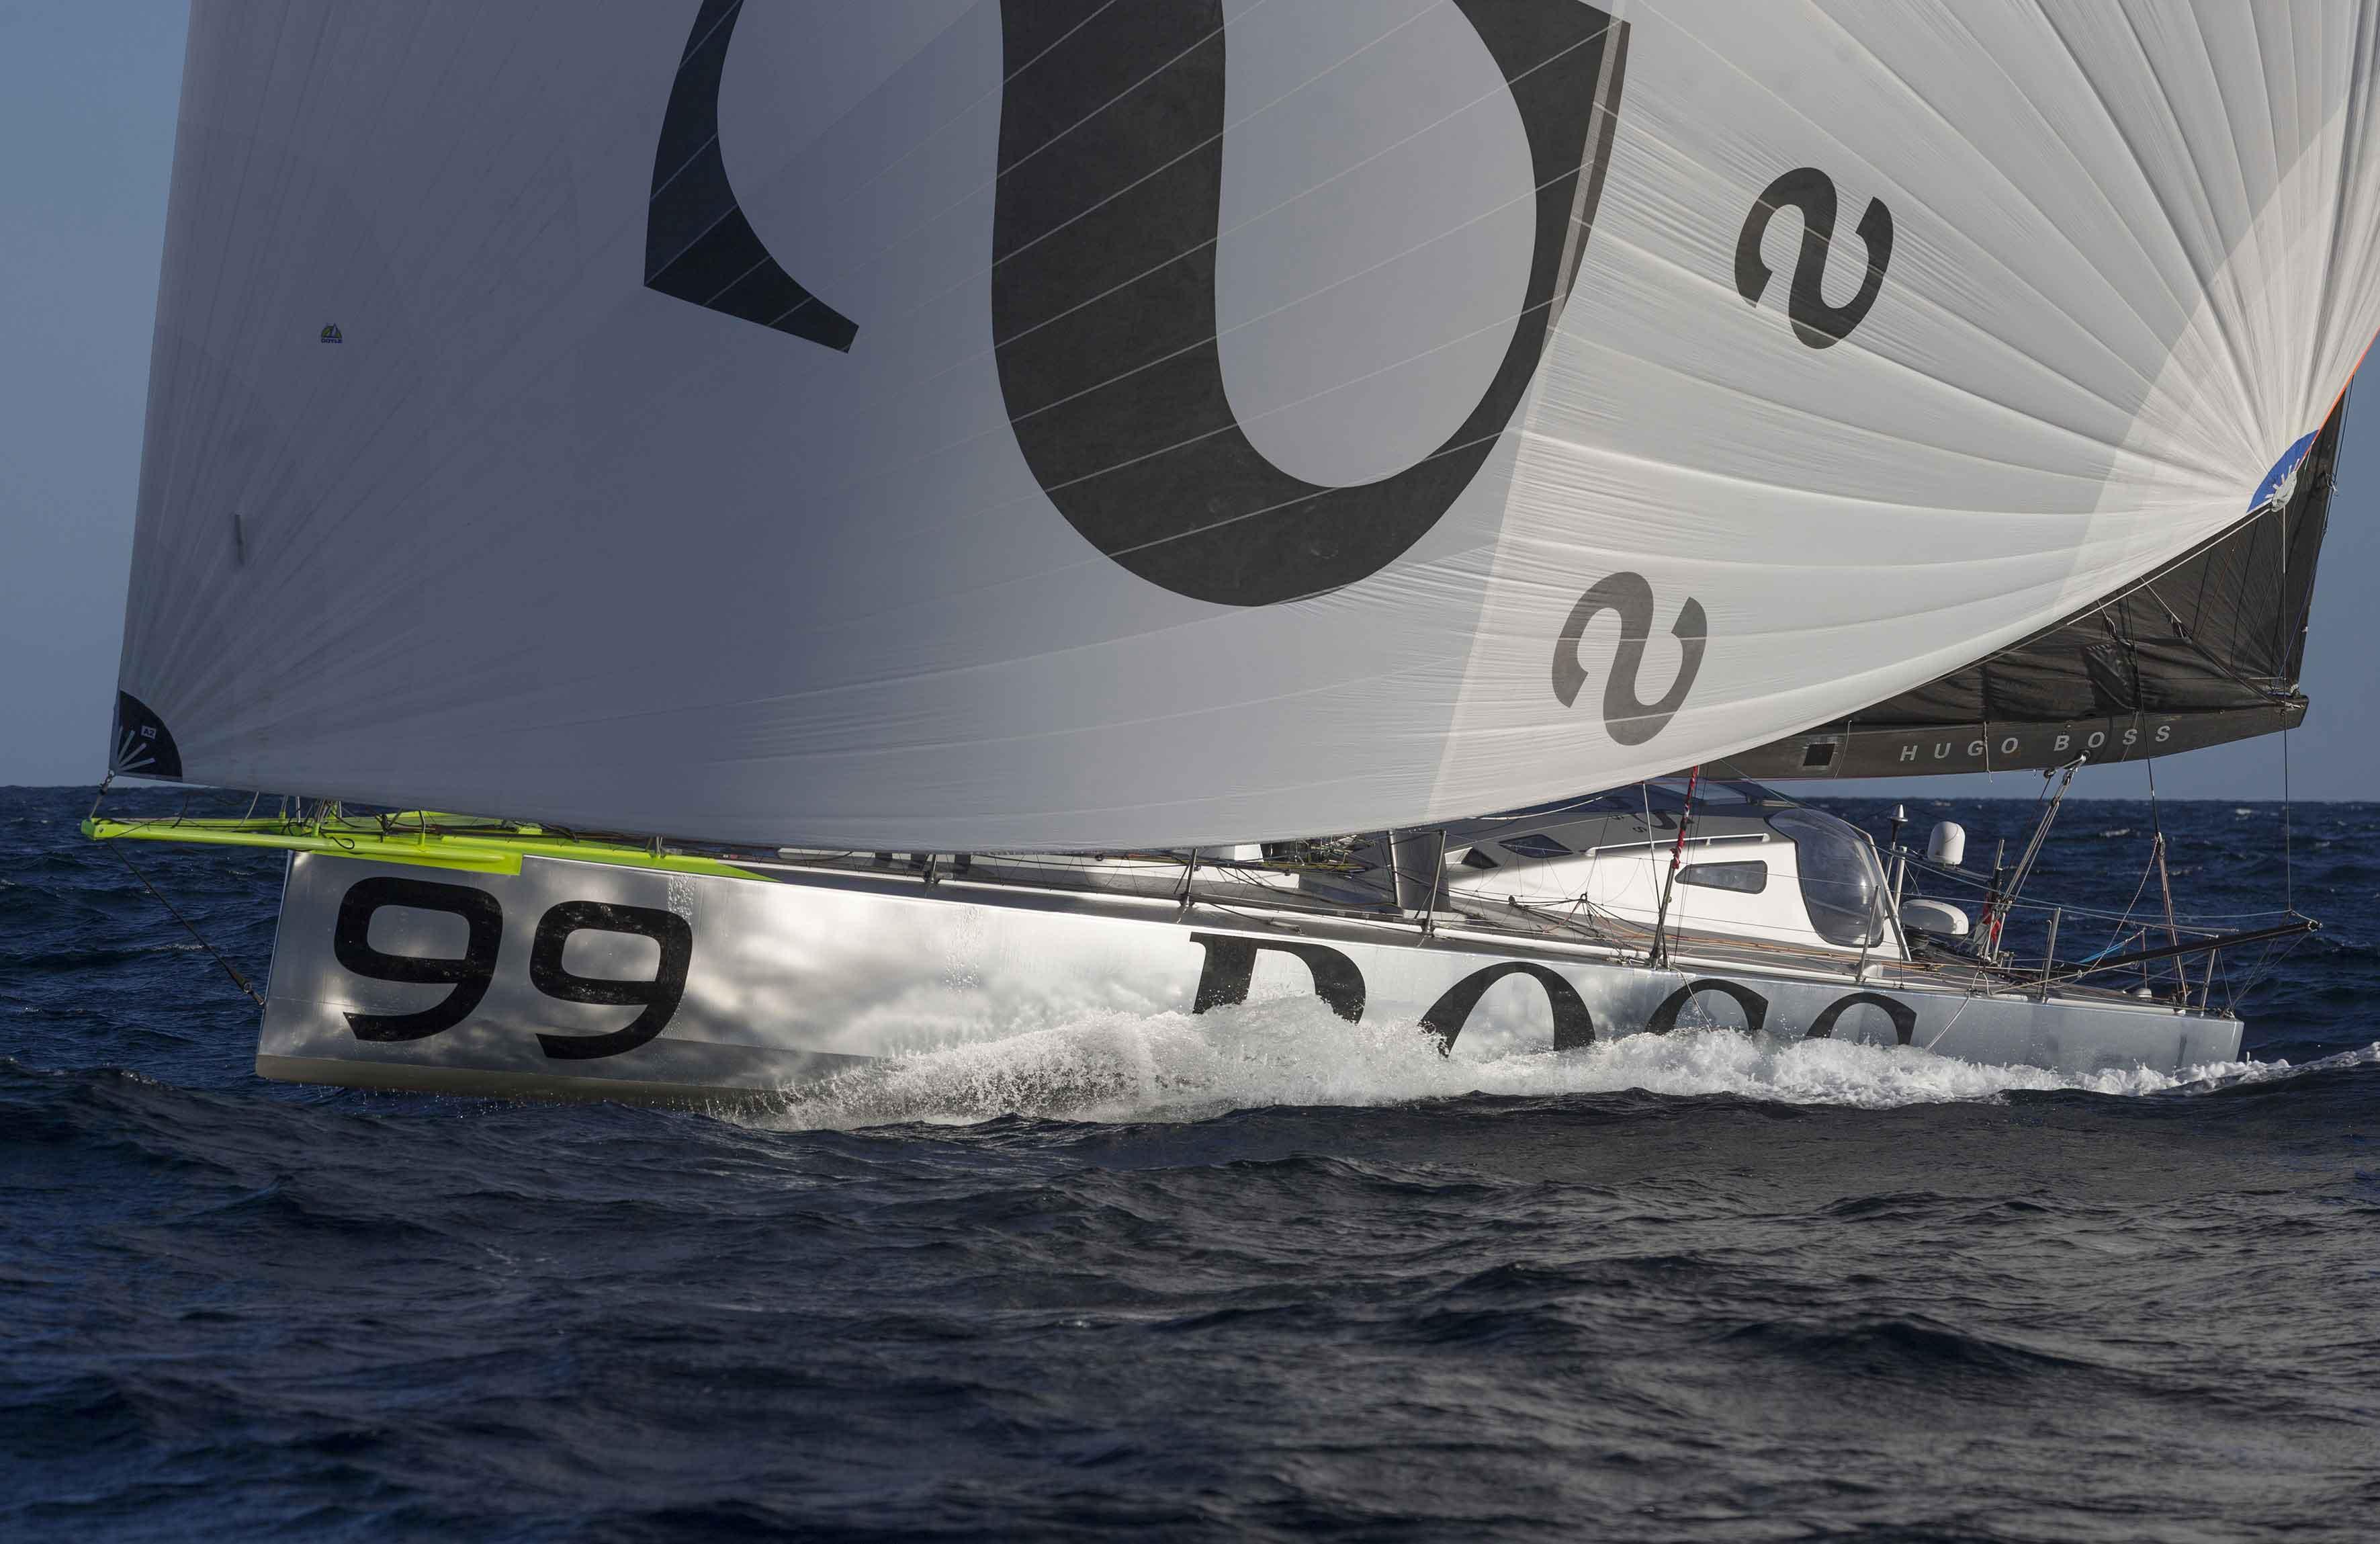 Doyle Sails Hugo Boss